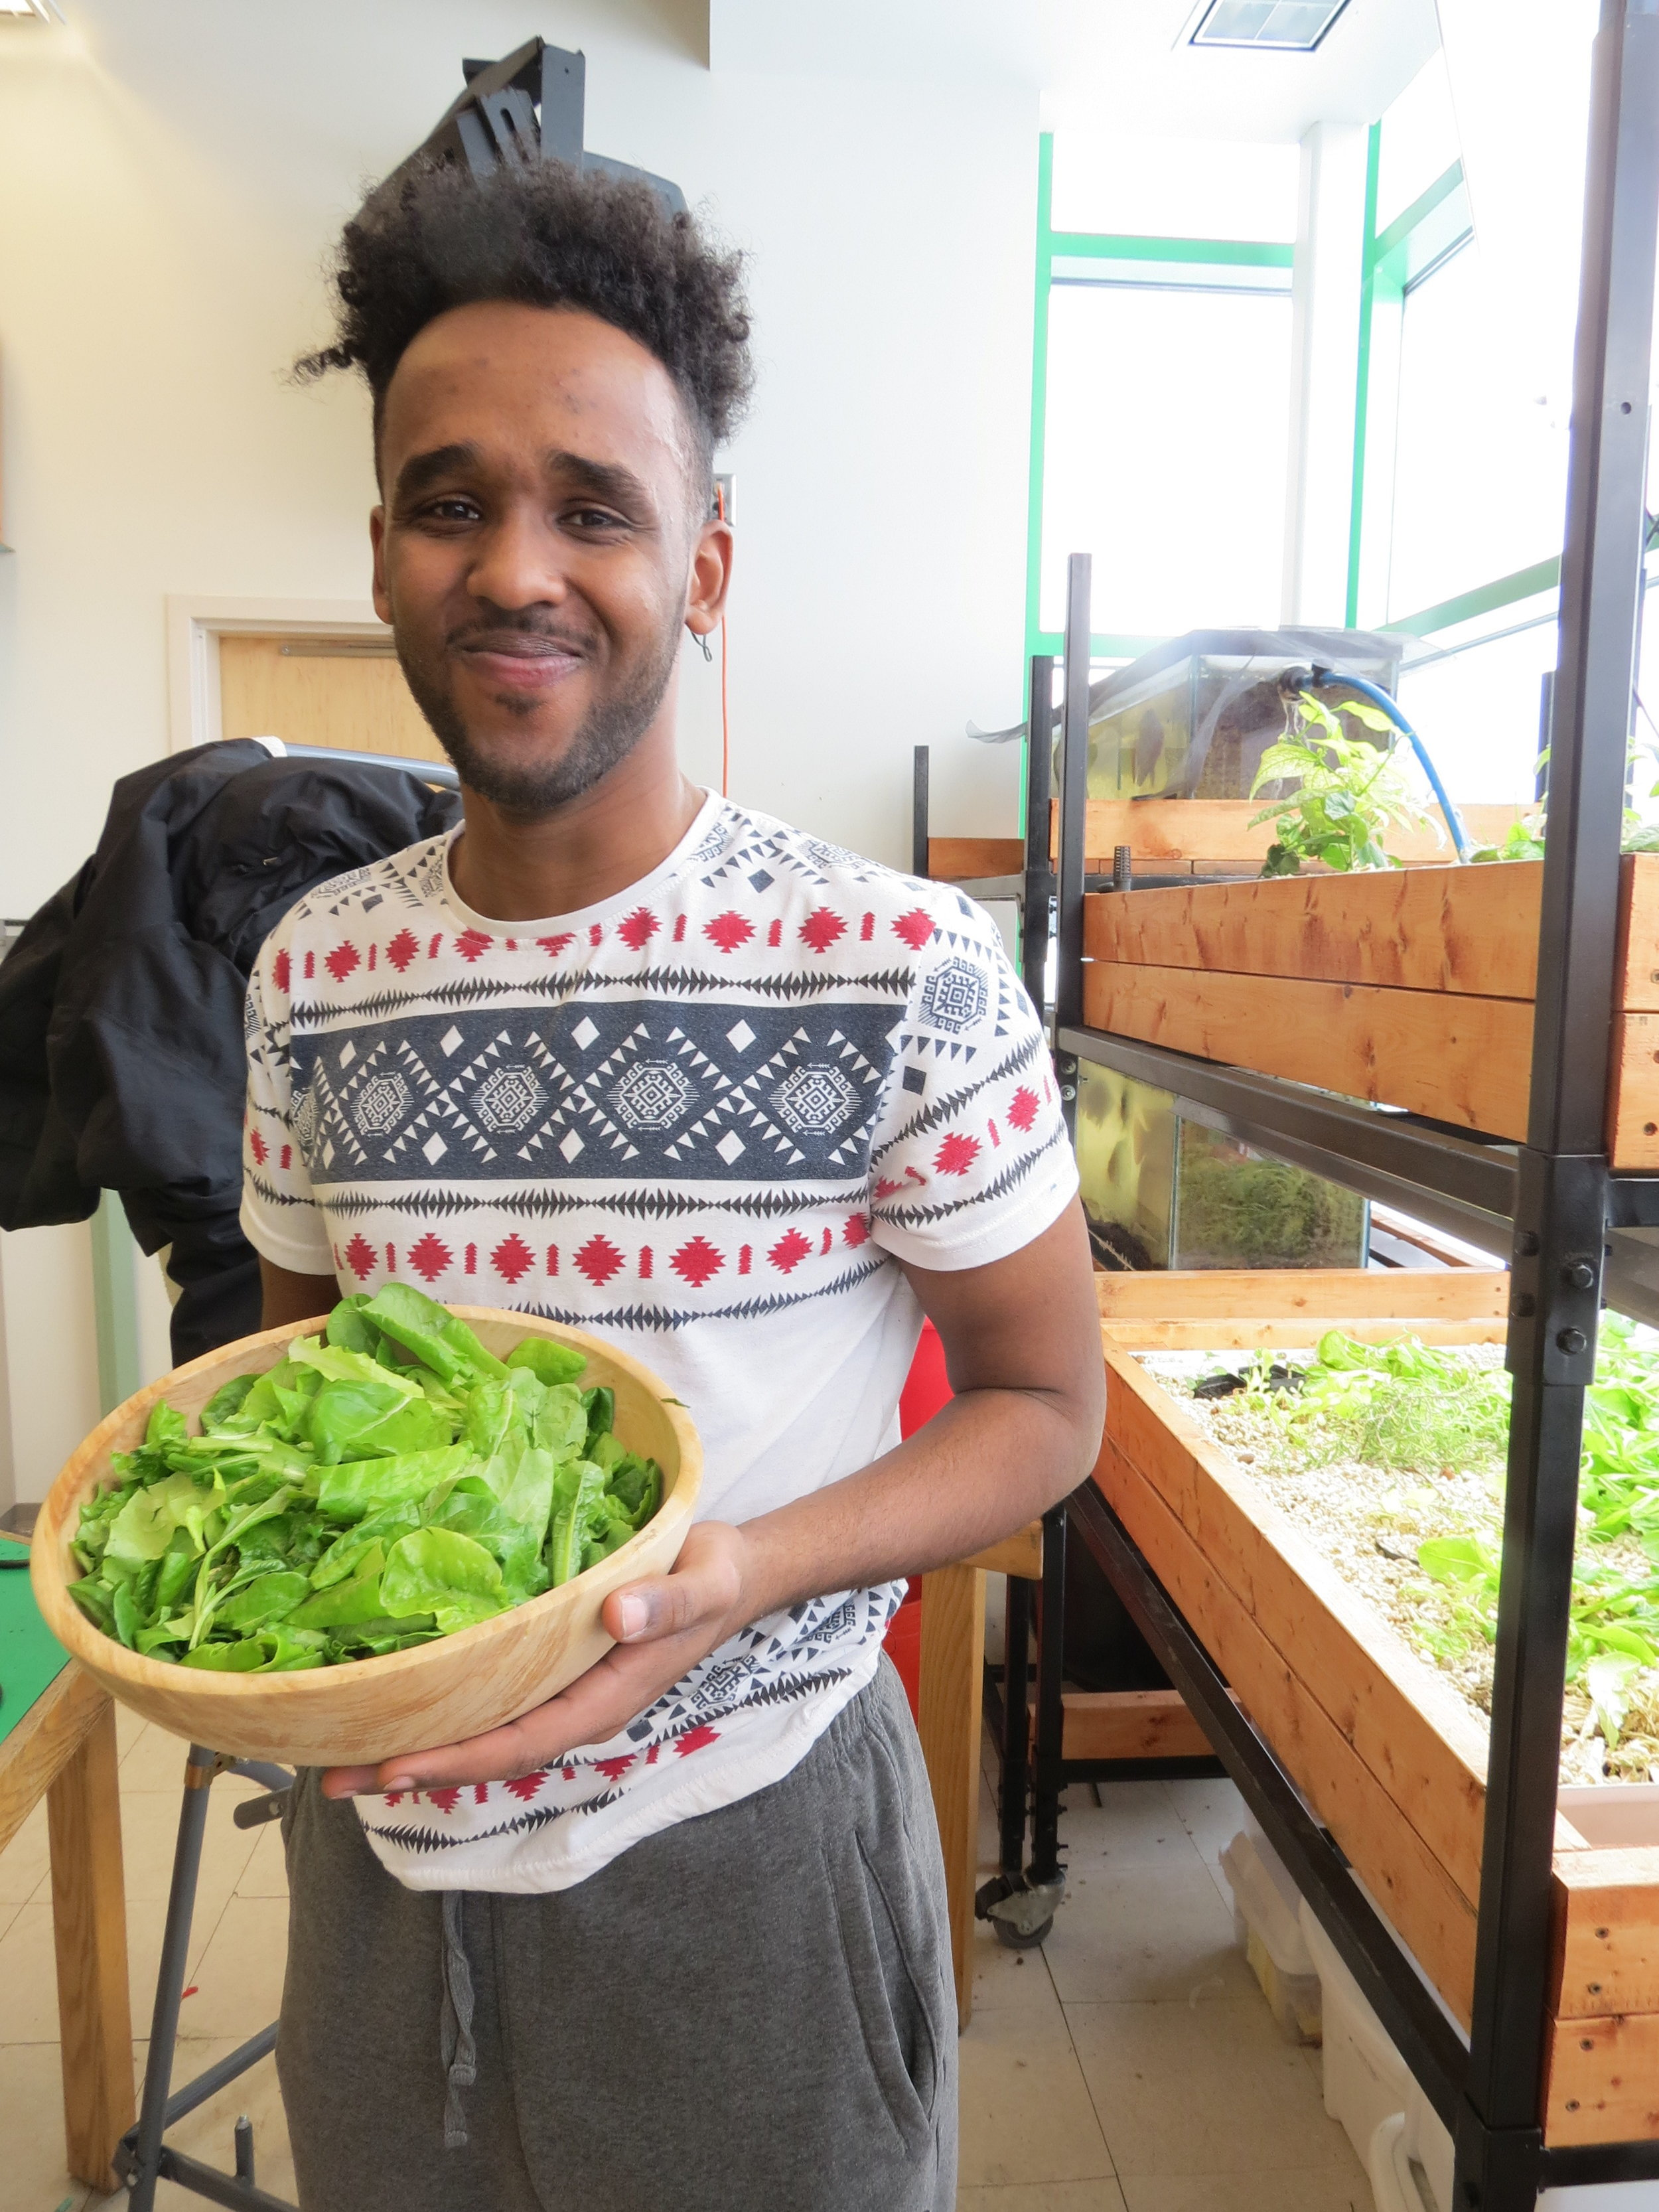 Spark-Y intern, Zak - With a fresh lettuce harvest!